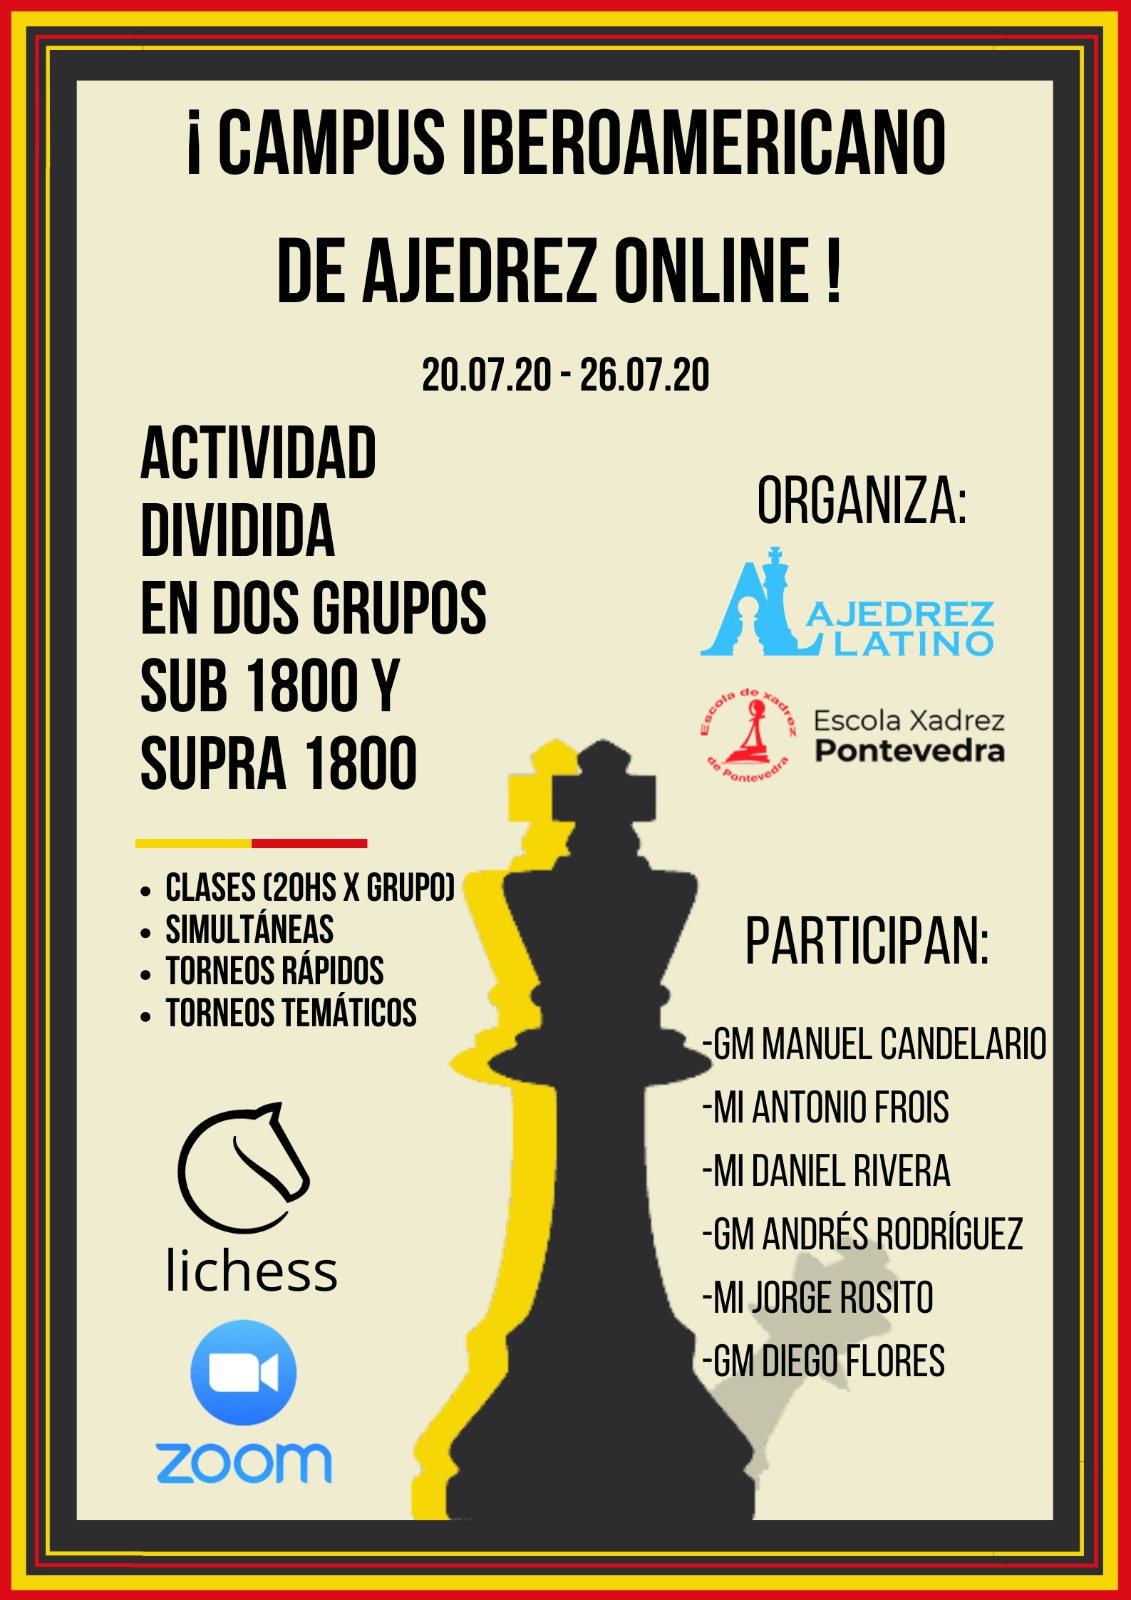 I Campus Iberoamericano de AJedrez Online